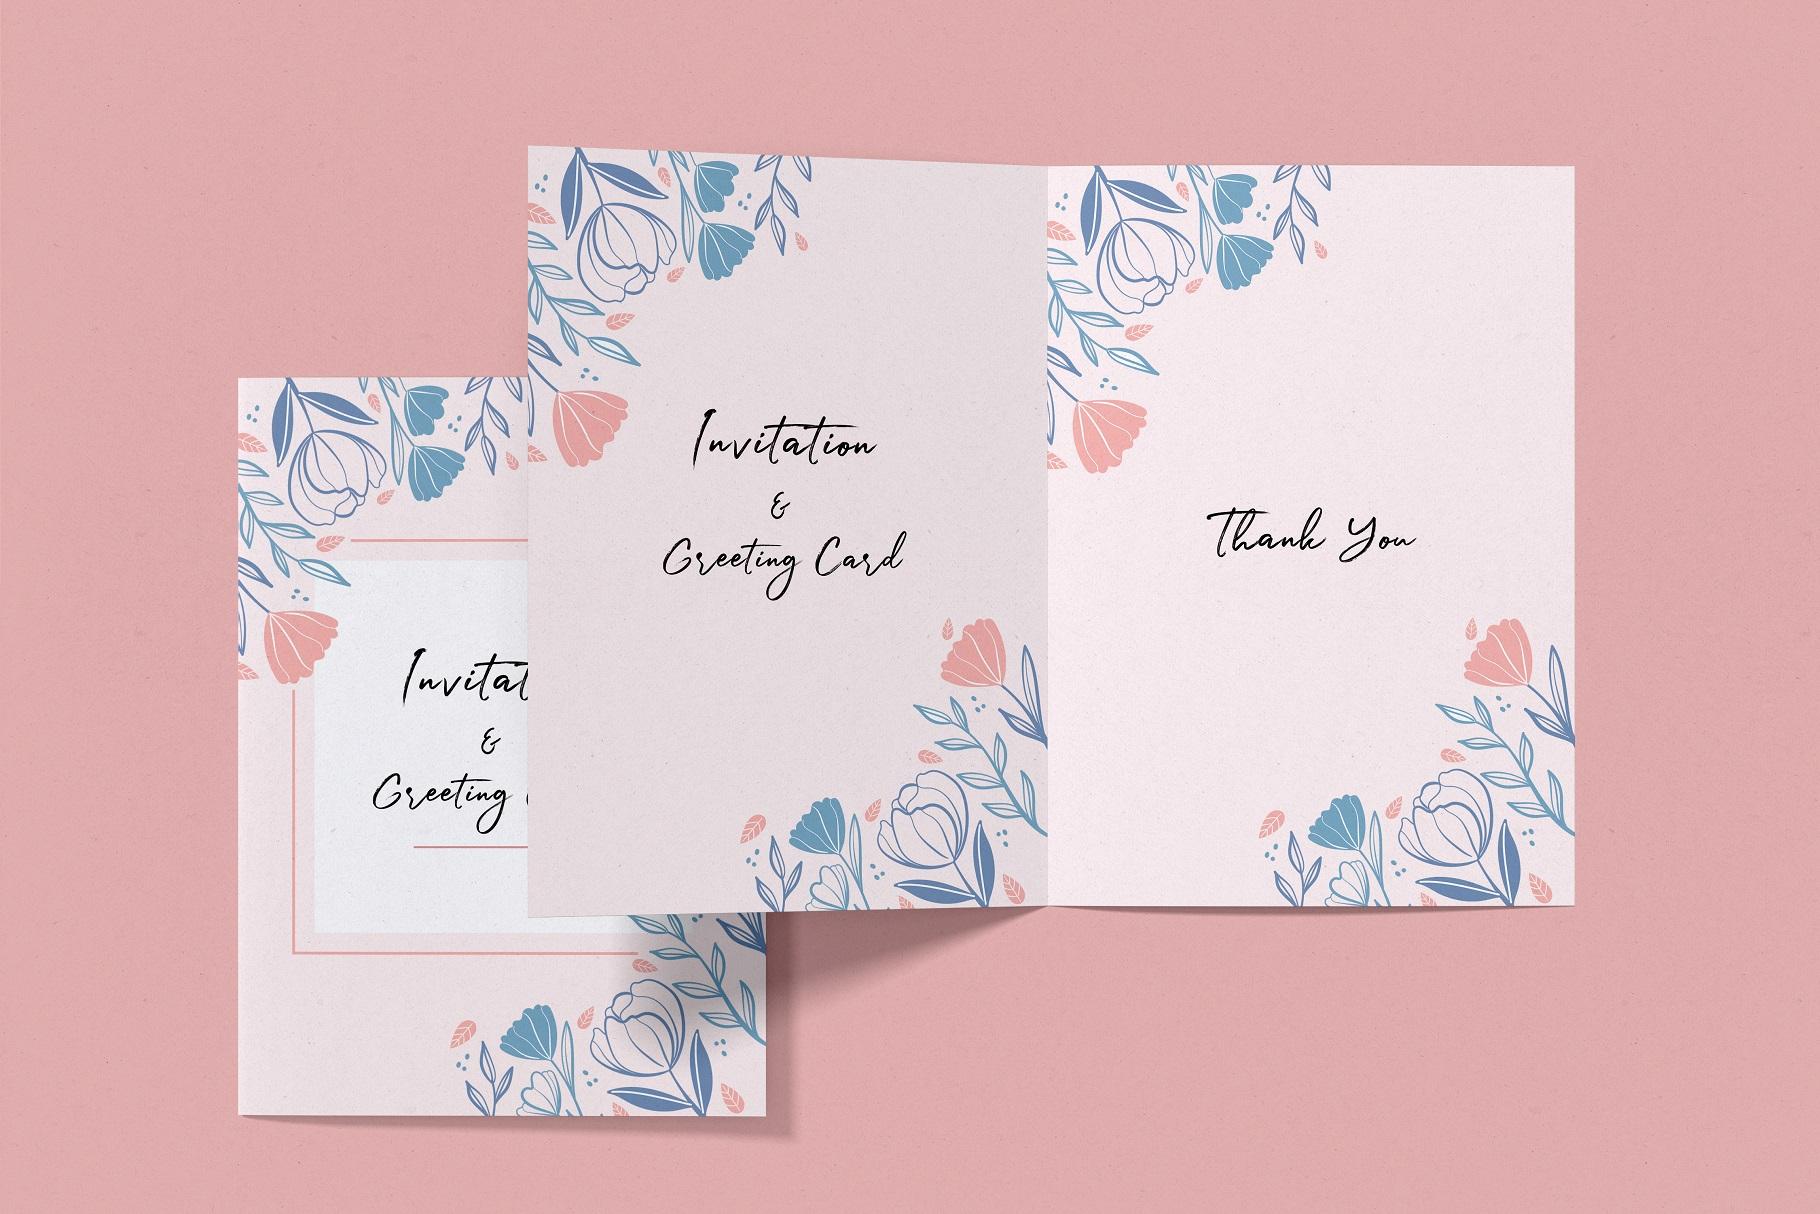 Invitation & Greeting Card Mockup example image 13